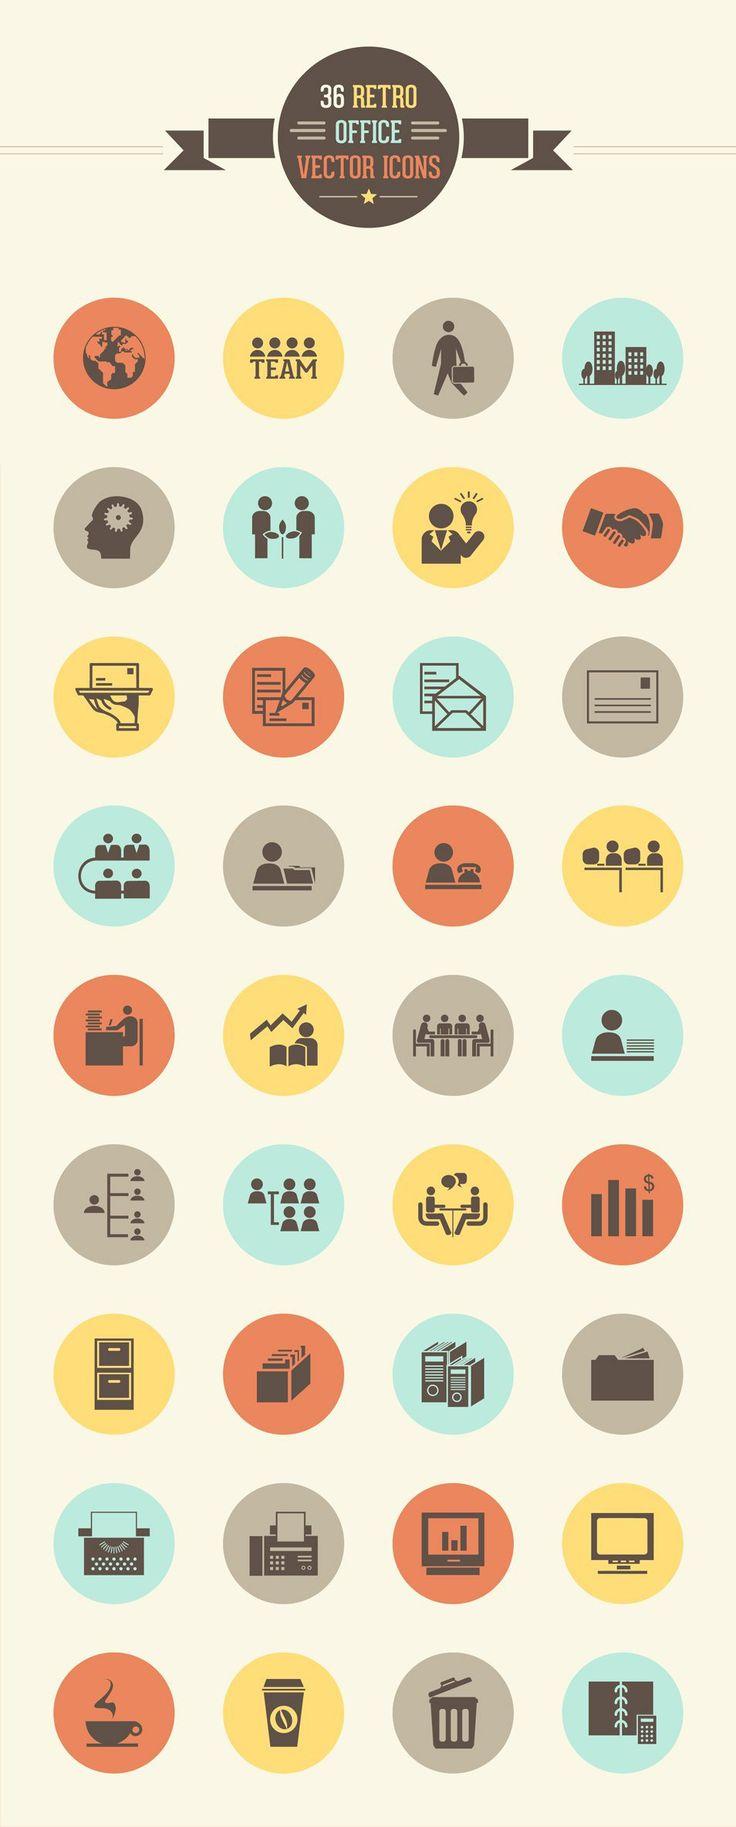 36 Retro Office Vector Icon Set, #AI, #Circular, #Flat, #Free, #Graphic #Design, #Icon, #Office, #PSD, #Resource, #Retro, #Round, #Vector